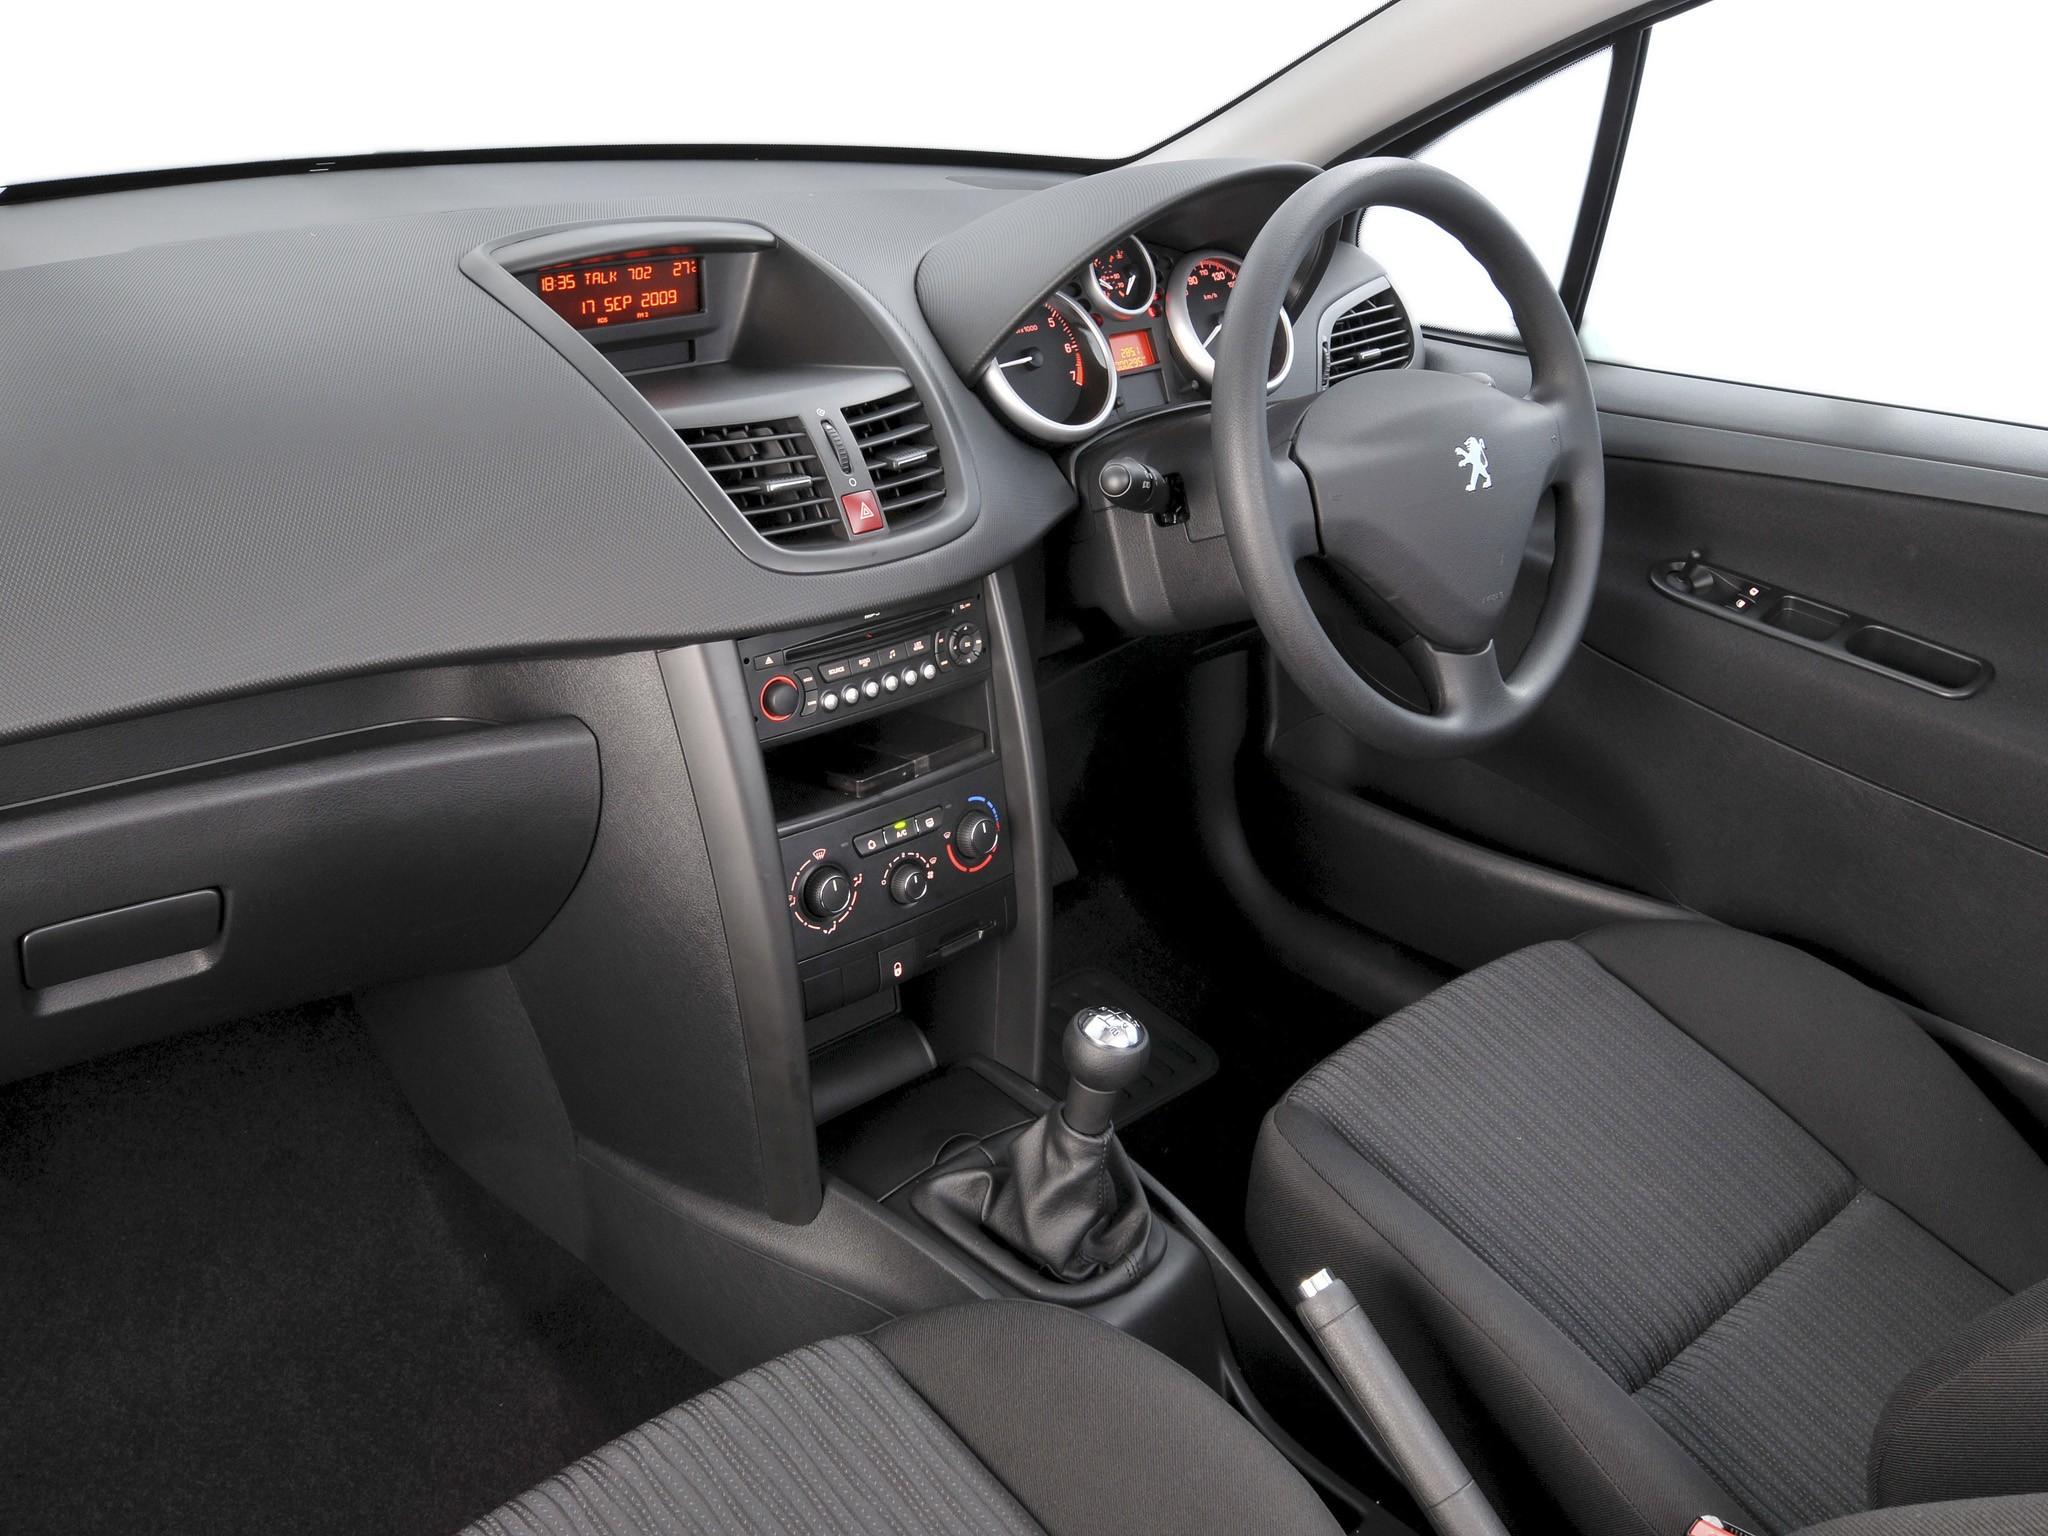 Peugeot 207 3 Doors Specs Amp Photos 2009 2010 2011